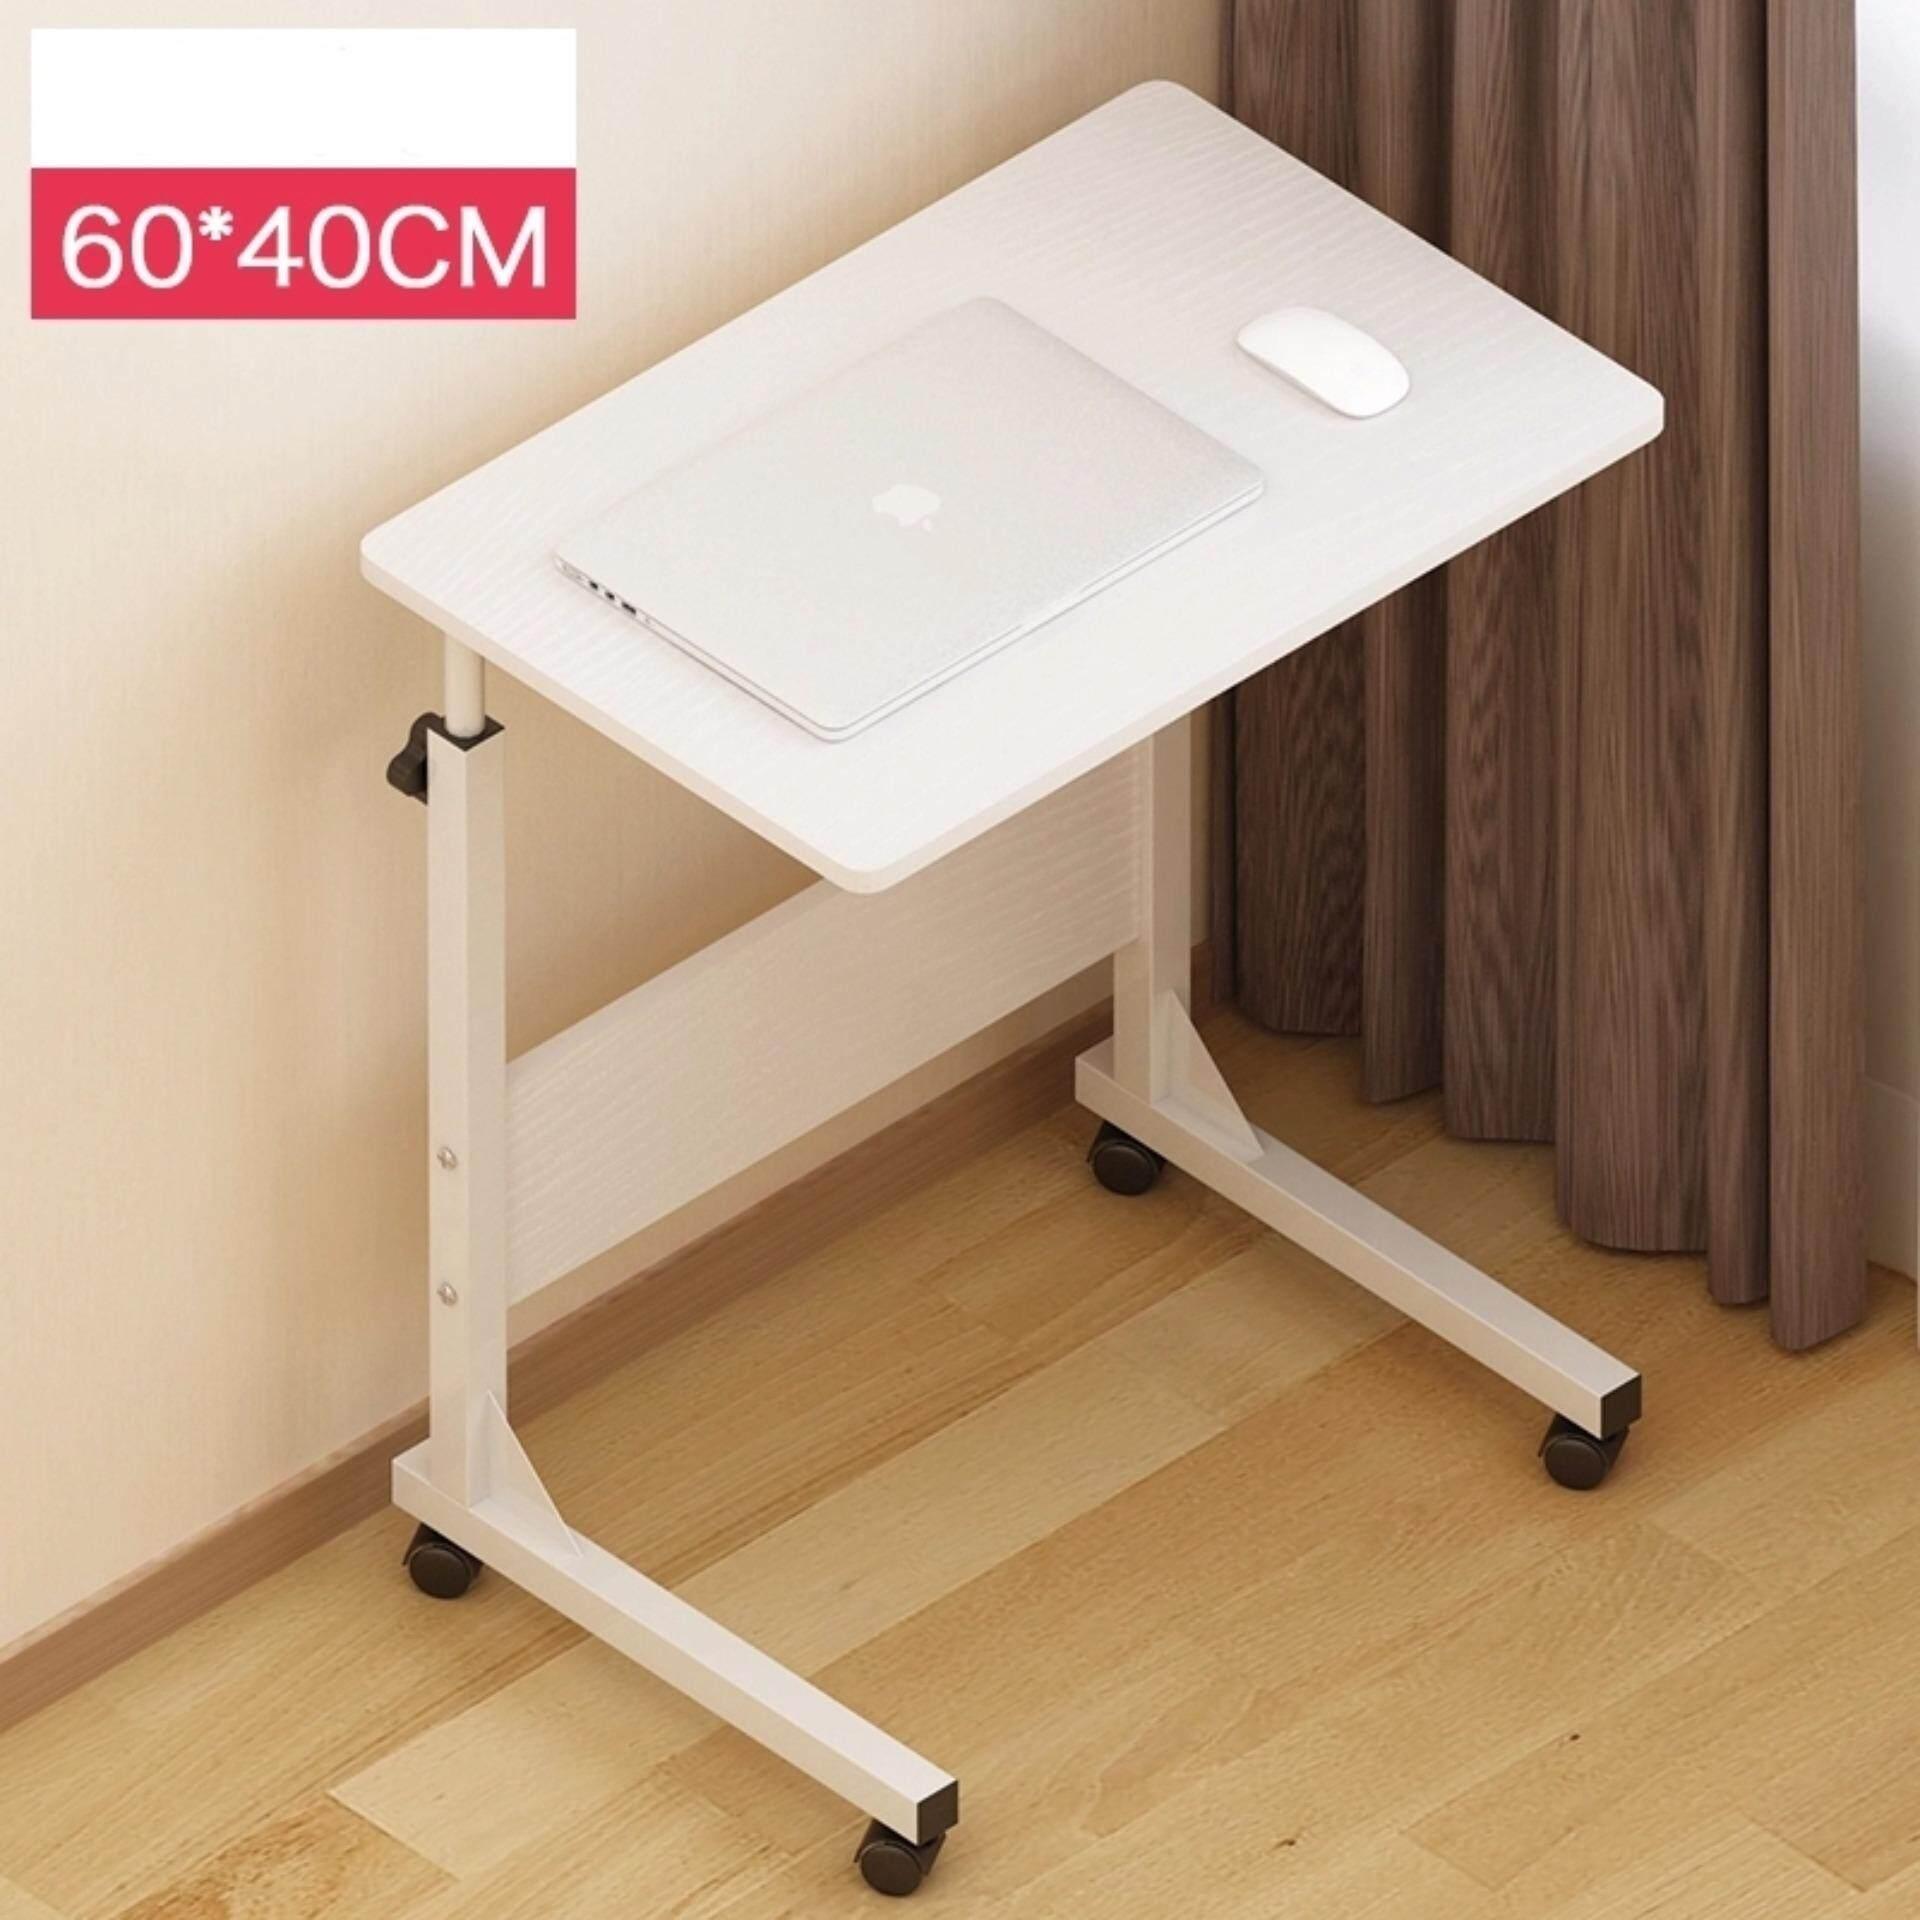 Cassa Sevil Mobile Height Adjustable Table 60cmx40cm With Wheels Laptop Computer Desk Only Maple Wenge Black